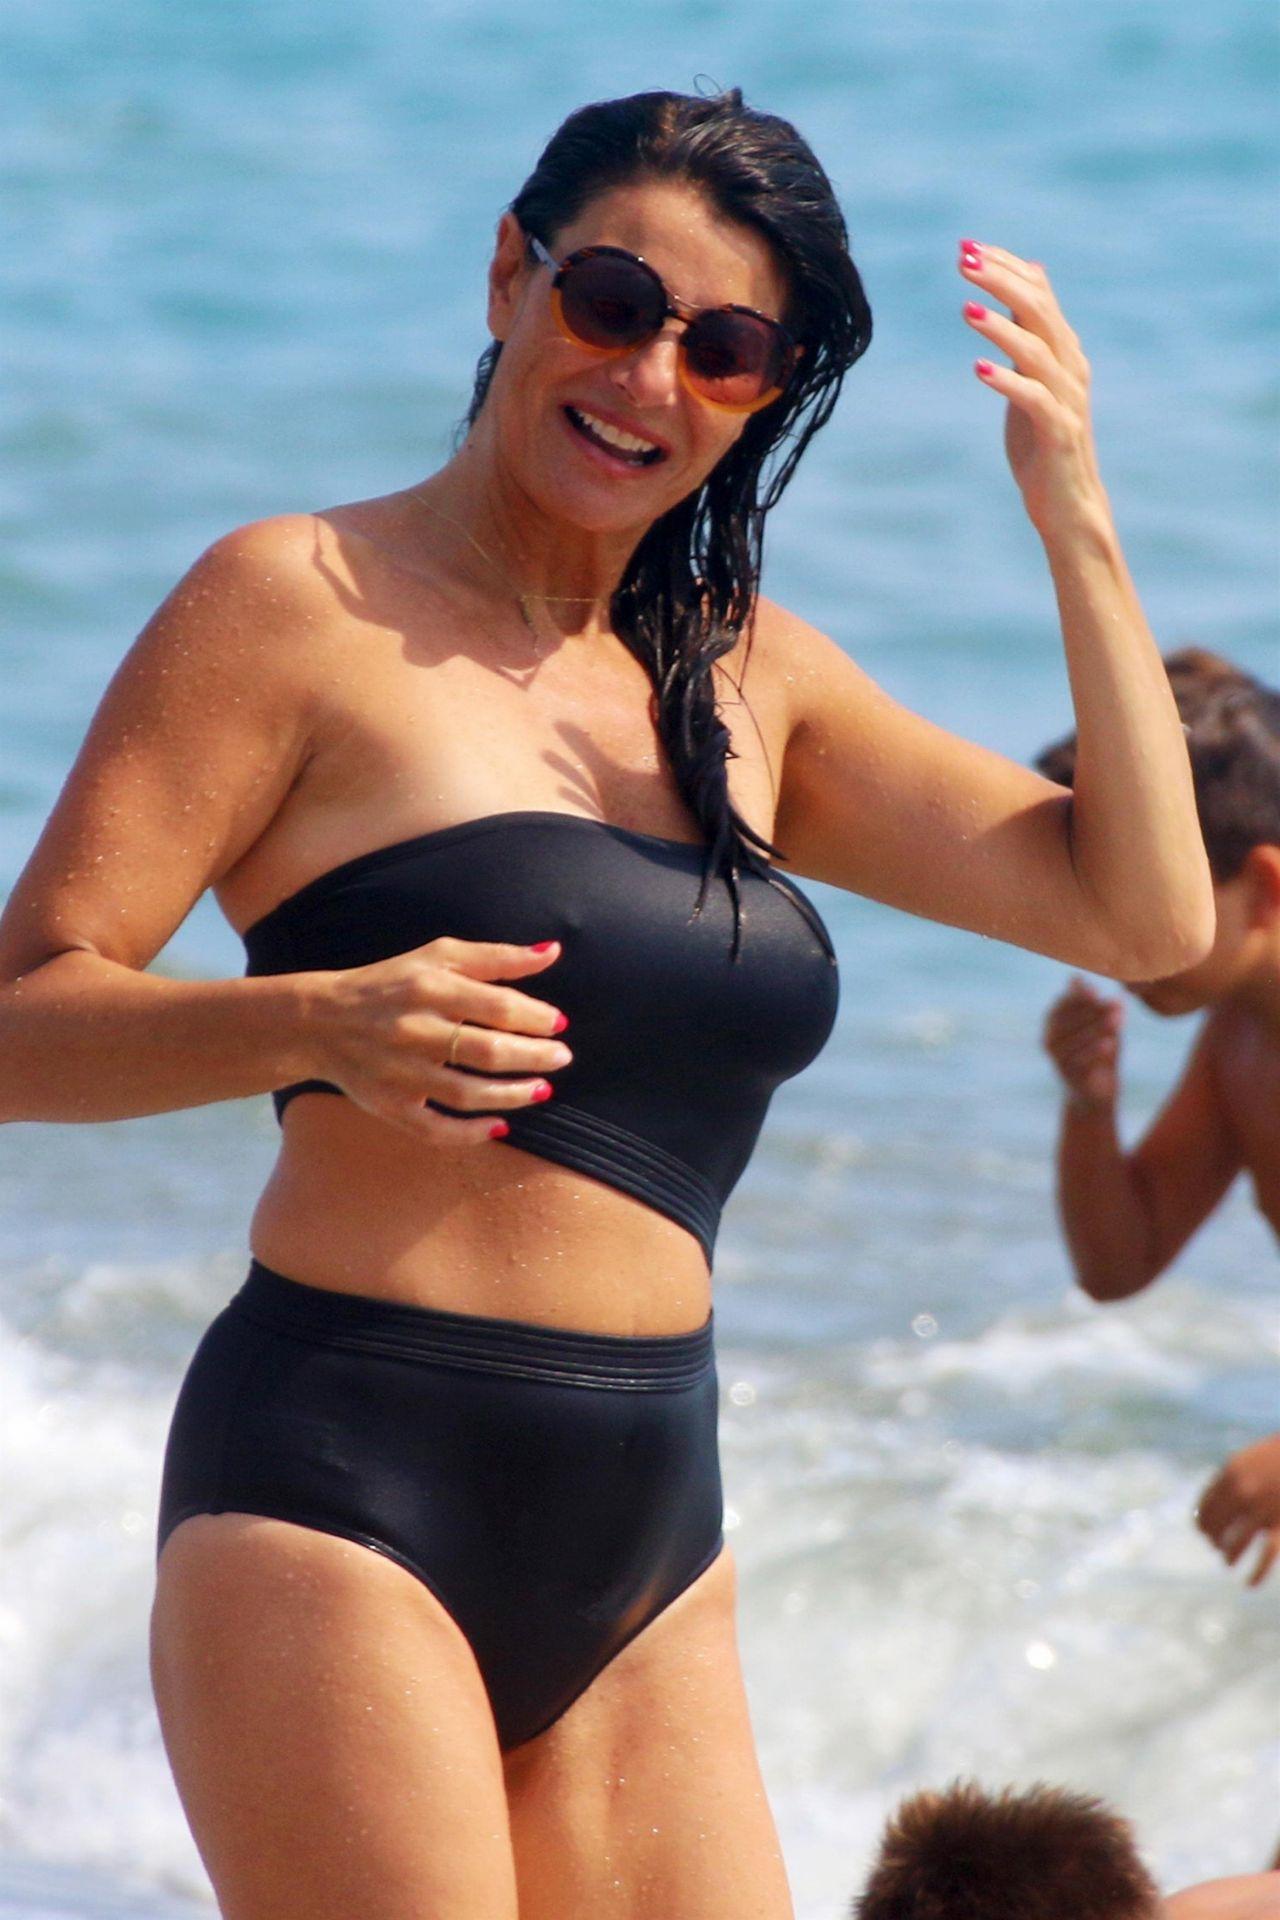 Bikini Ilaria D?Amico nude (17 photo), Tits, Bikini, Selfie, lingerie 2006